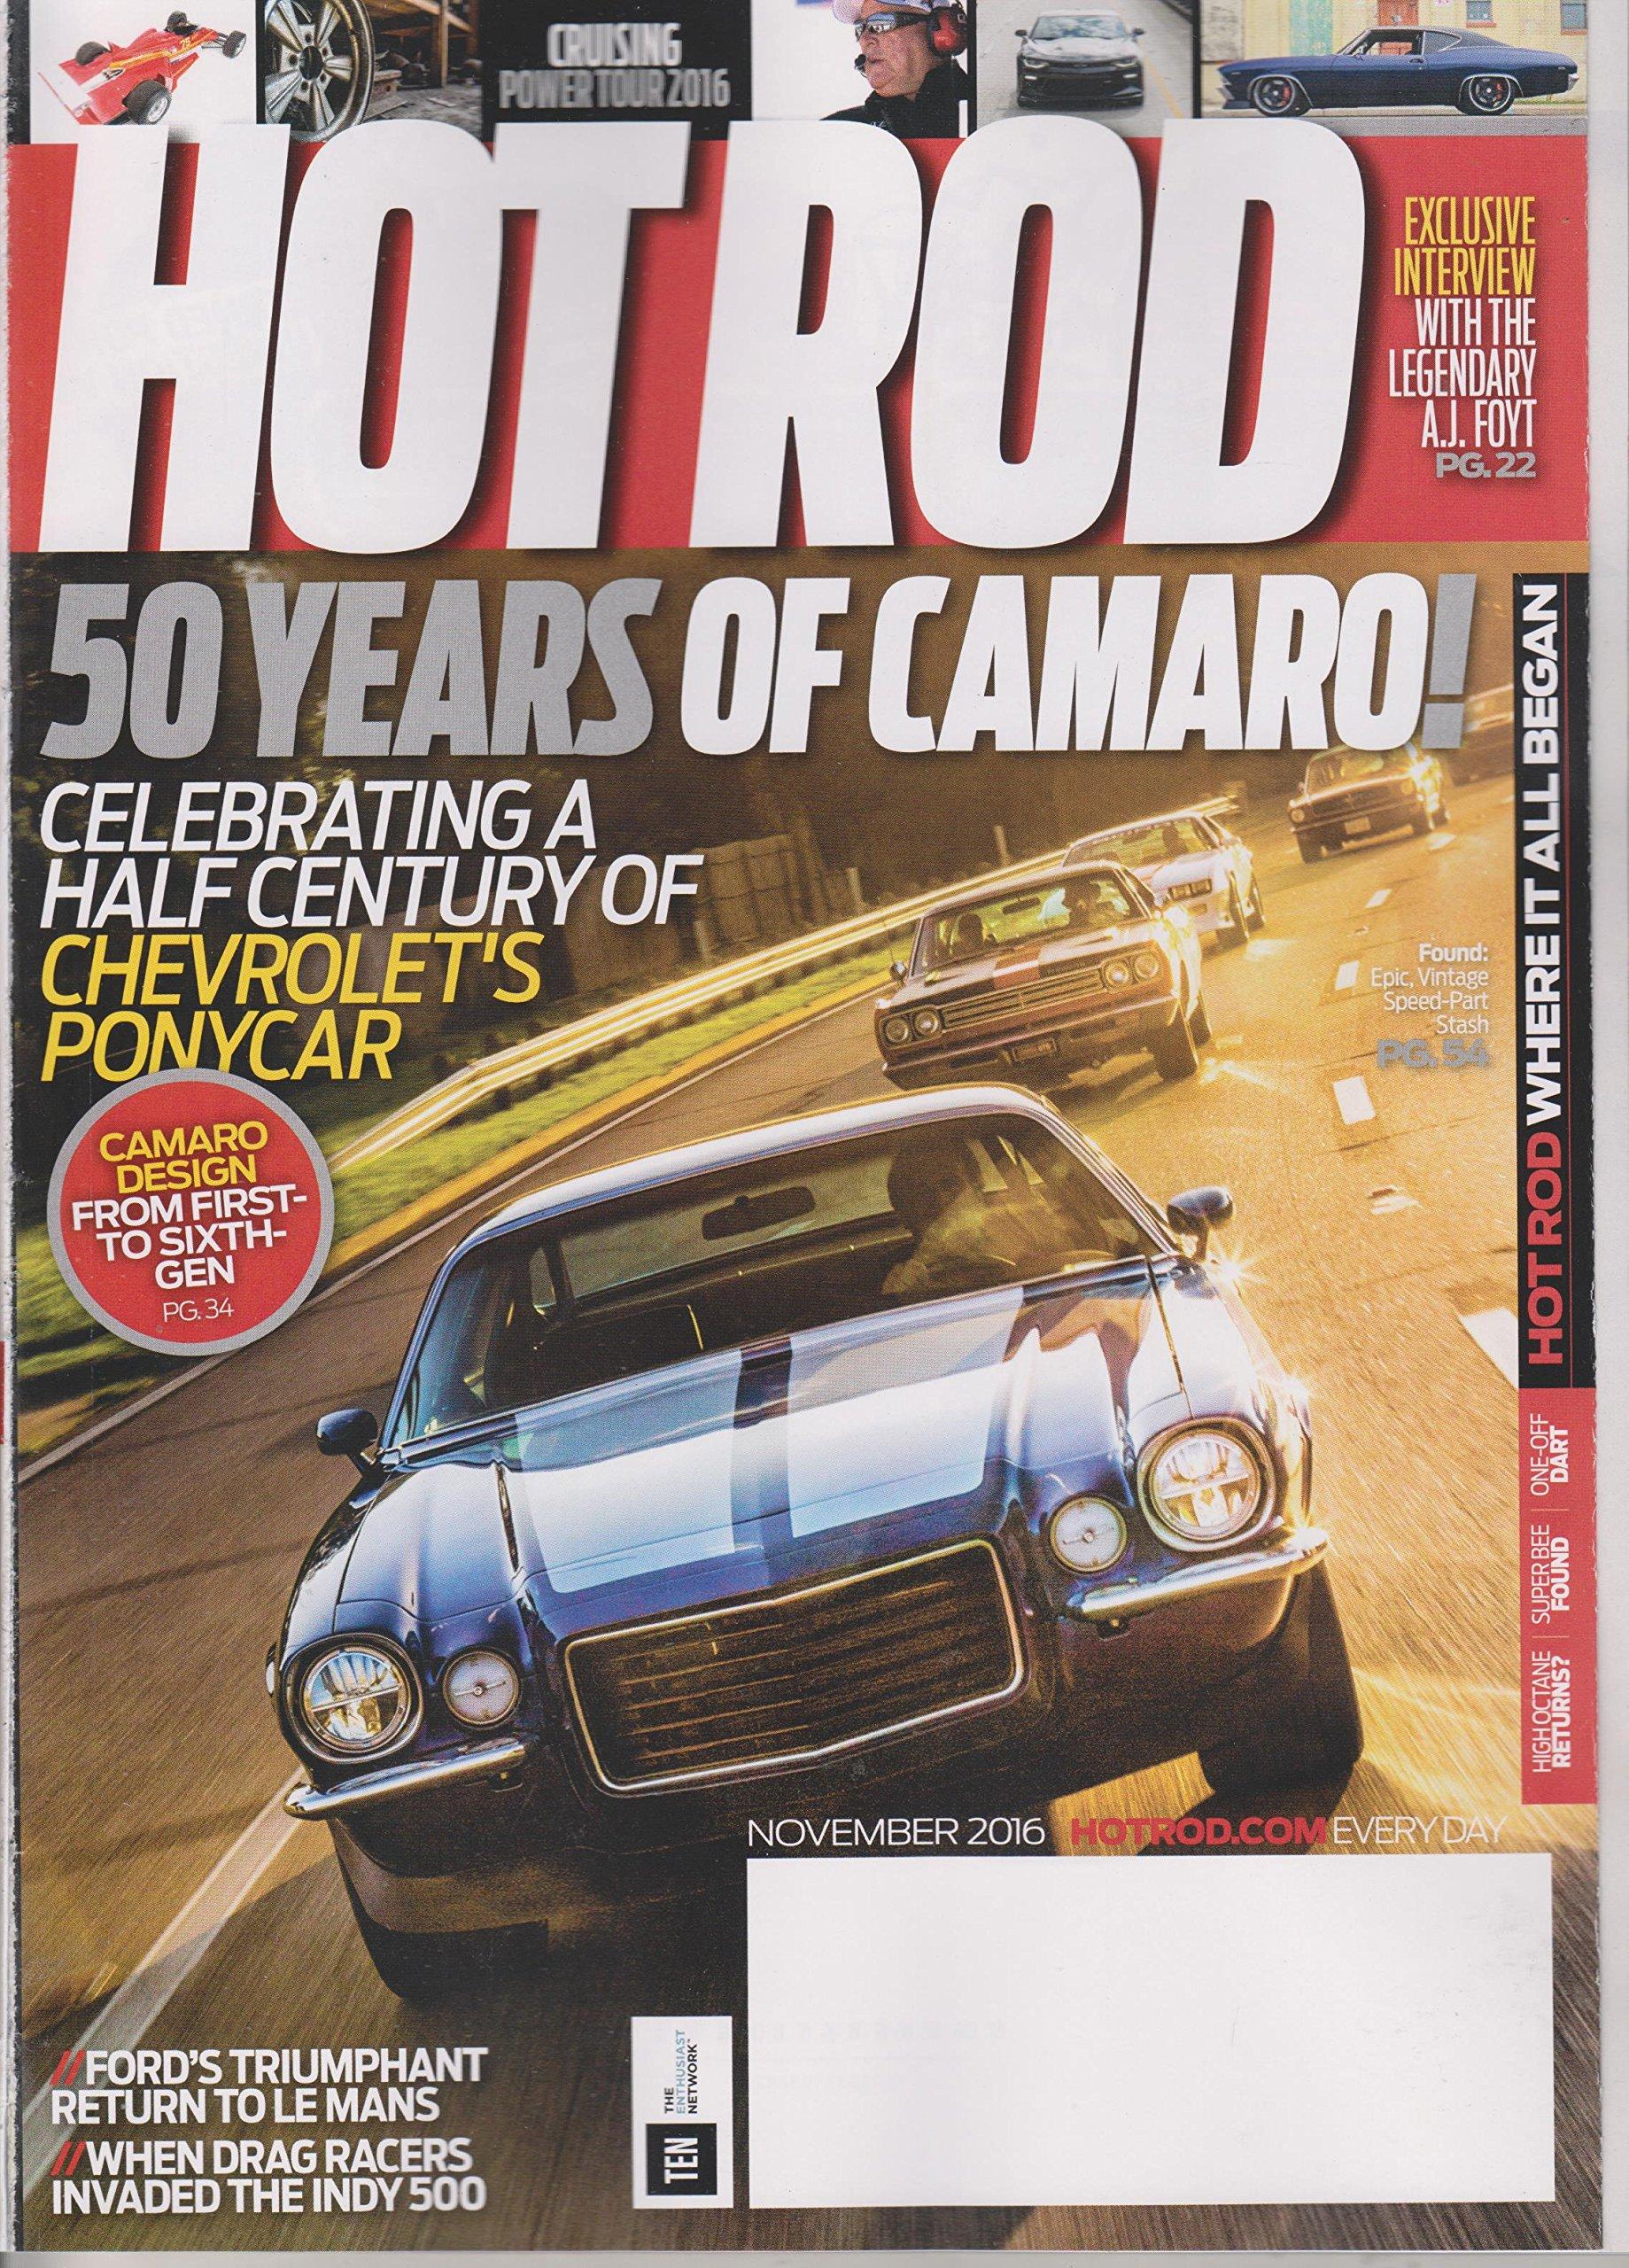 Hot Rod November 2016 50 Years of Camaro! Camaro Design From First to Sixth Generation ebook